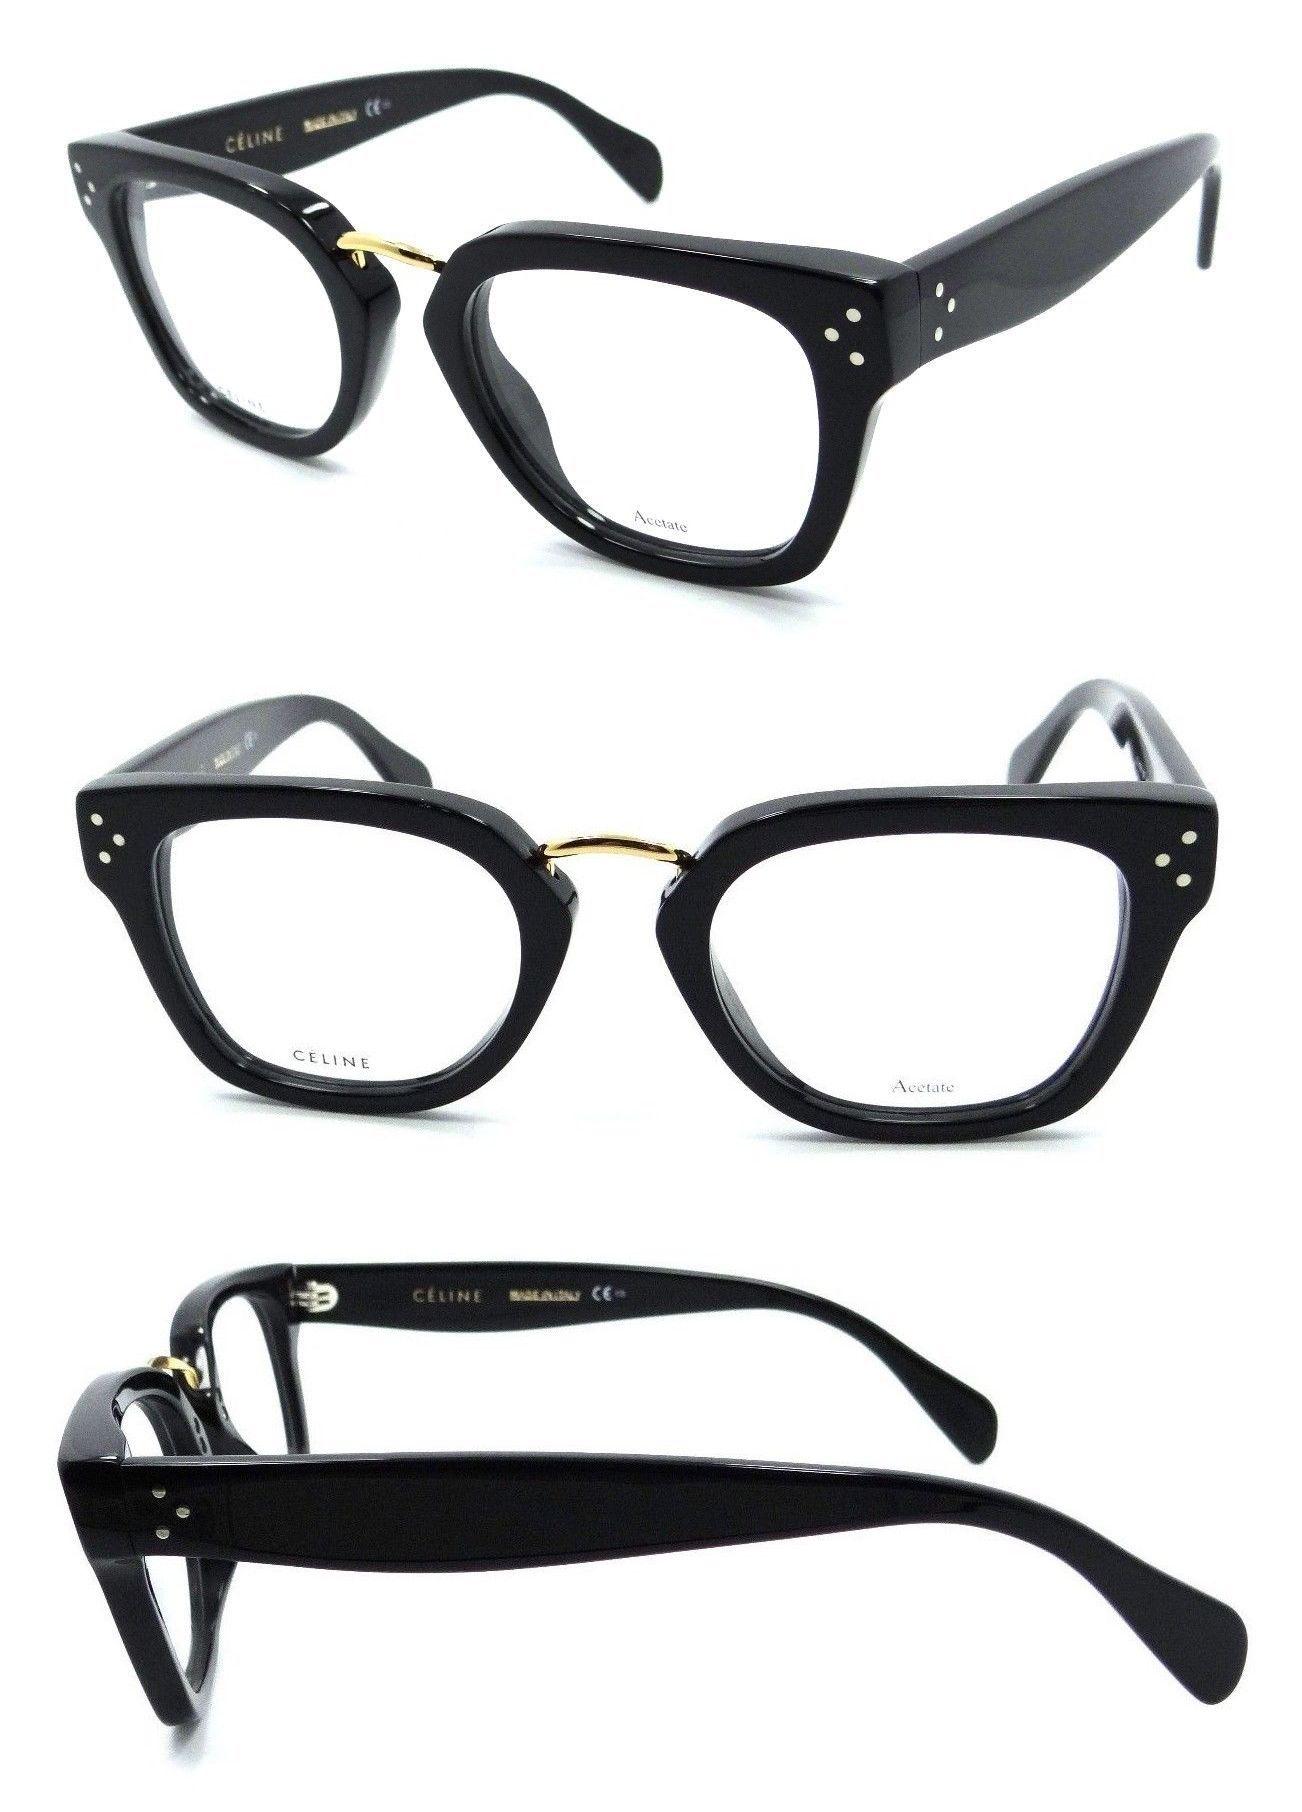 a61996e16360 Eyeglass Frames 180957  Celine Rx Eyeglasses Frames Cl 41351 807 48-21-145  Black Made In Italy -  BUY IT NOW ONLY   139.4 on  eBay  eyeglass  frames   celine ...